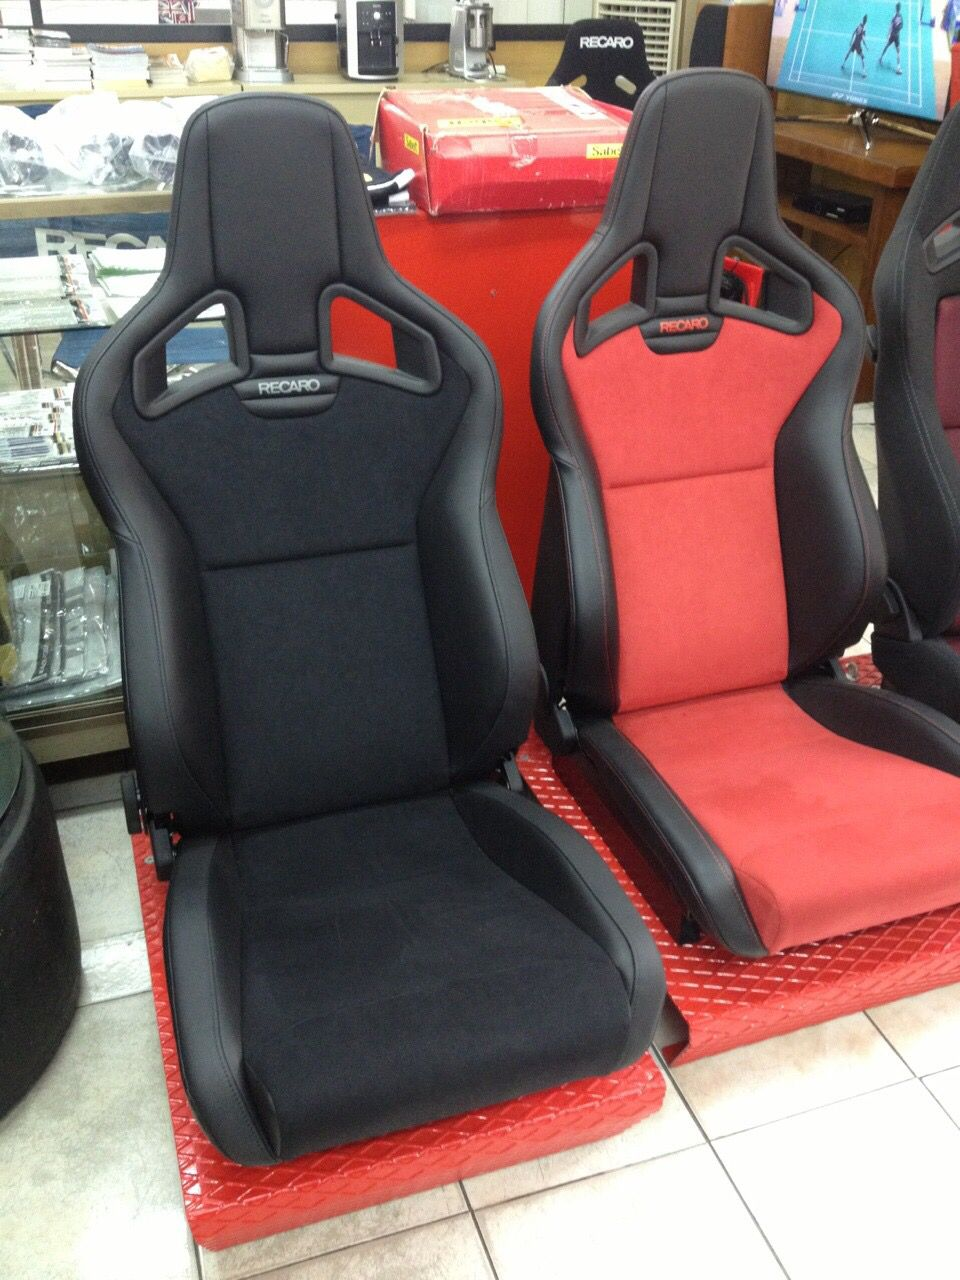 Recaro Racing seats, Recaro, Lexus gs300